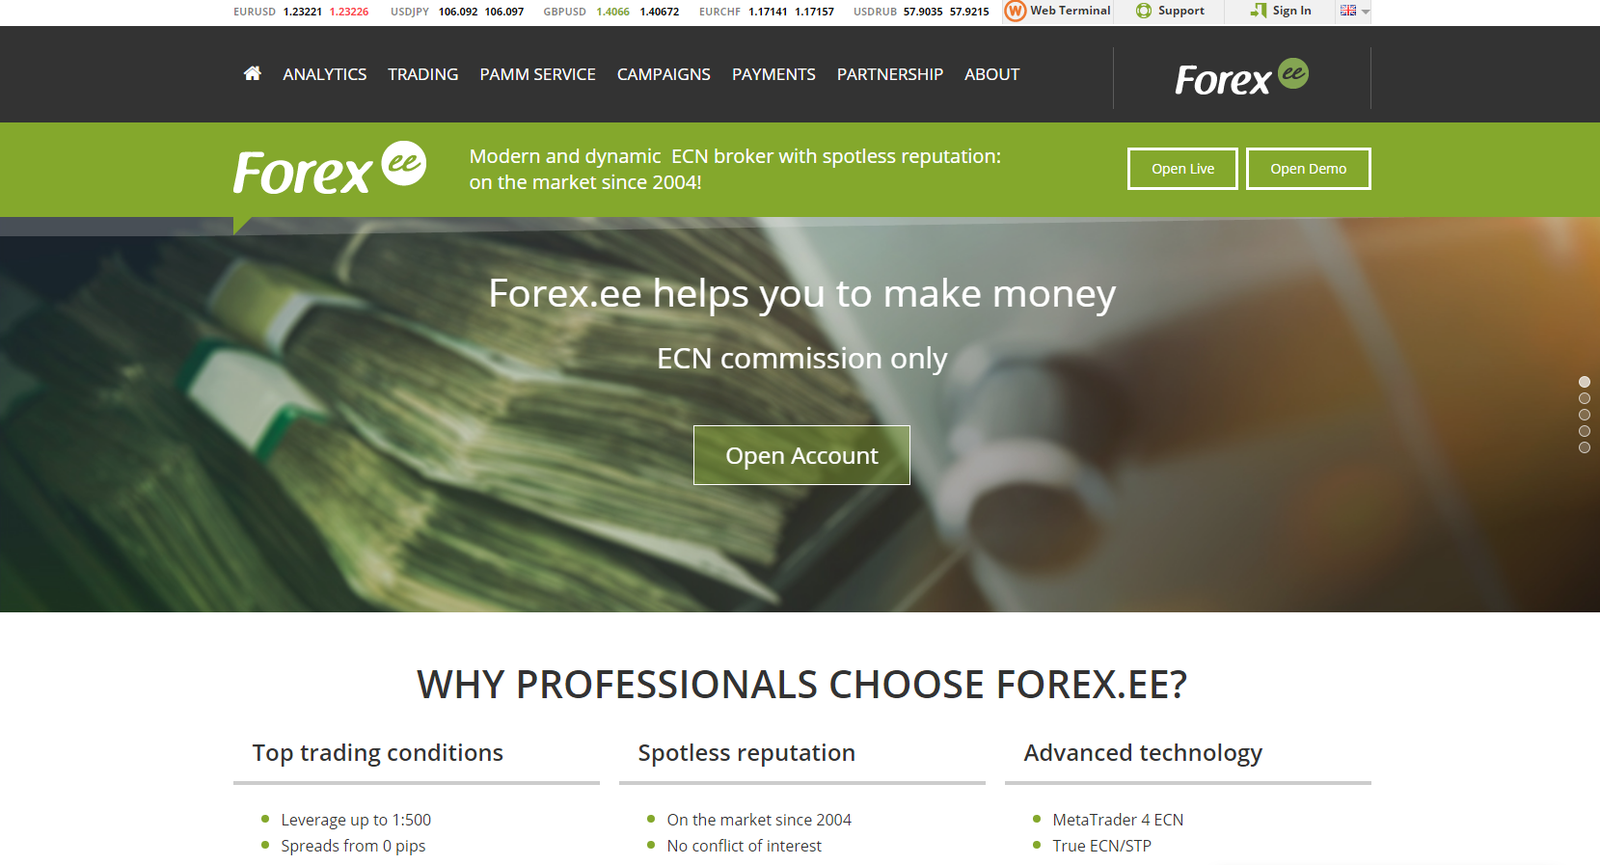 Forex.ee 评论